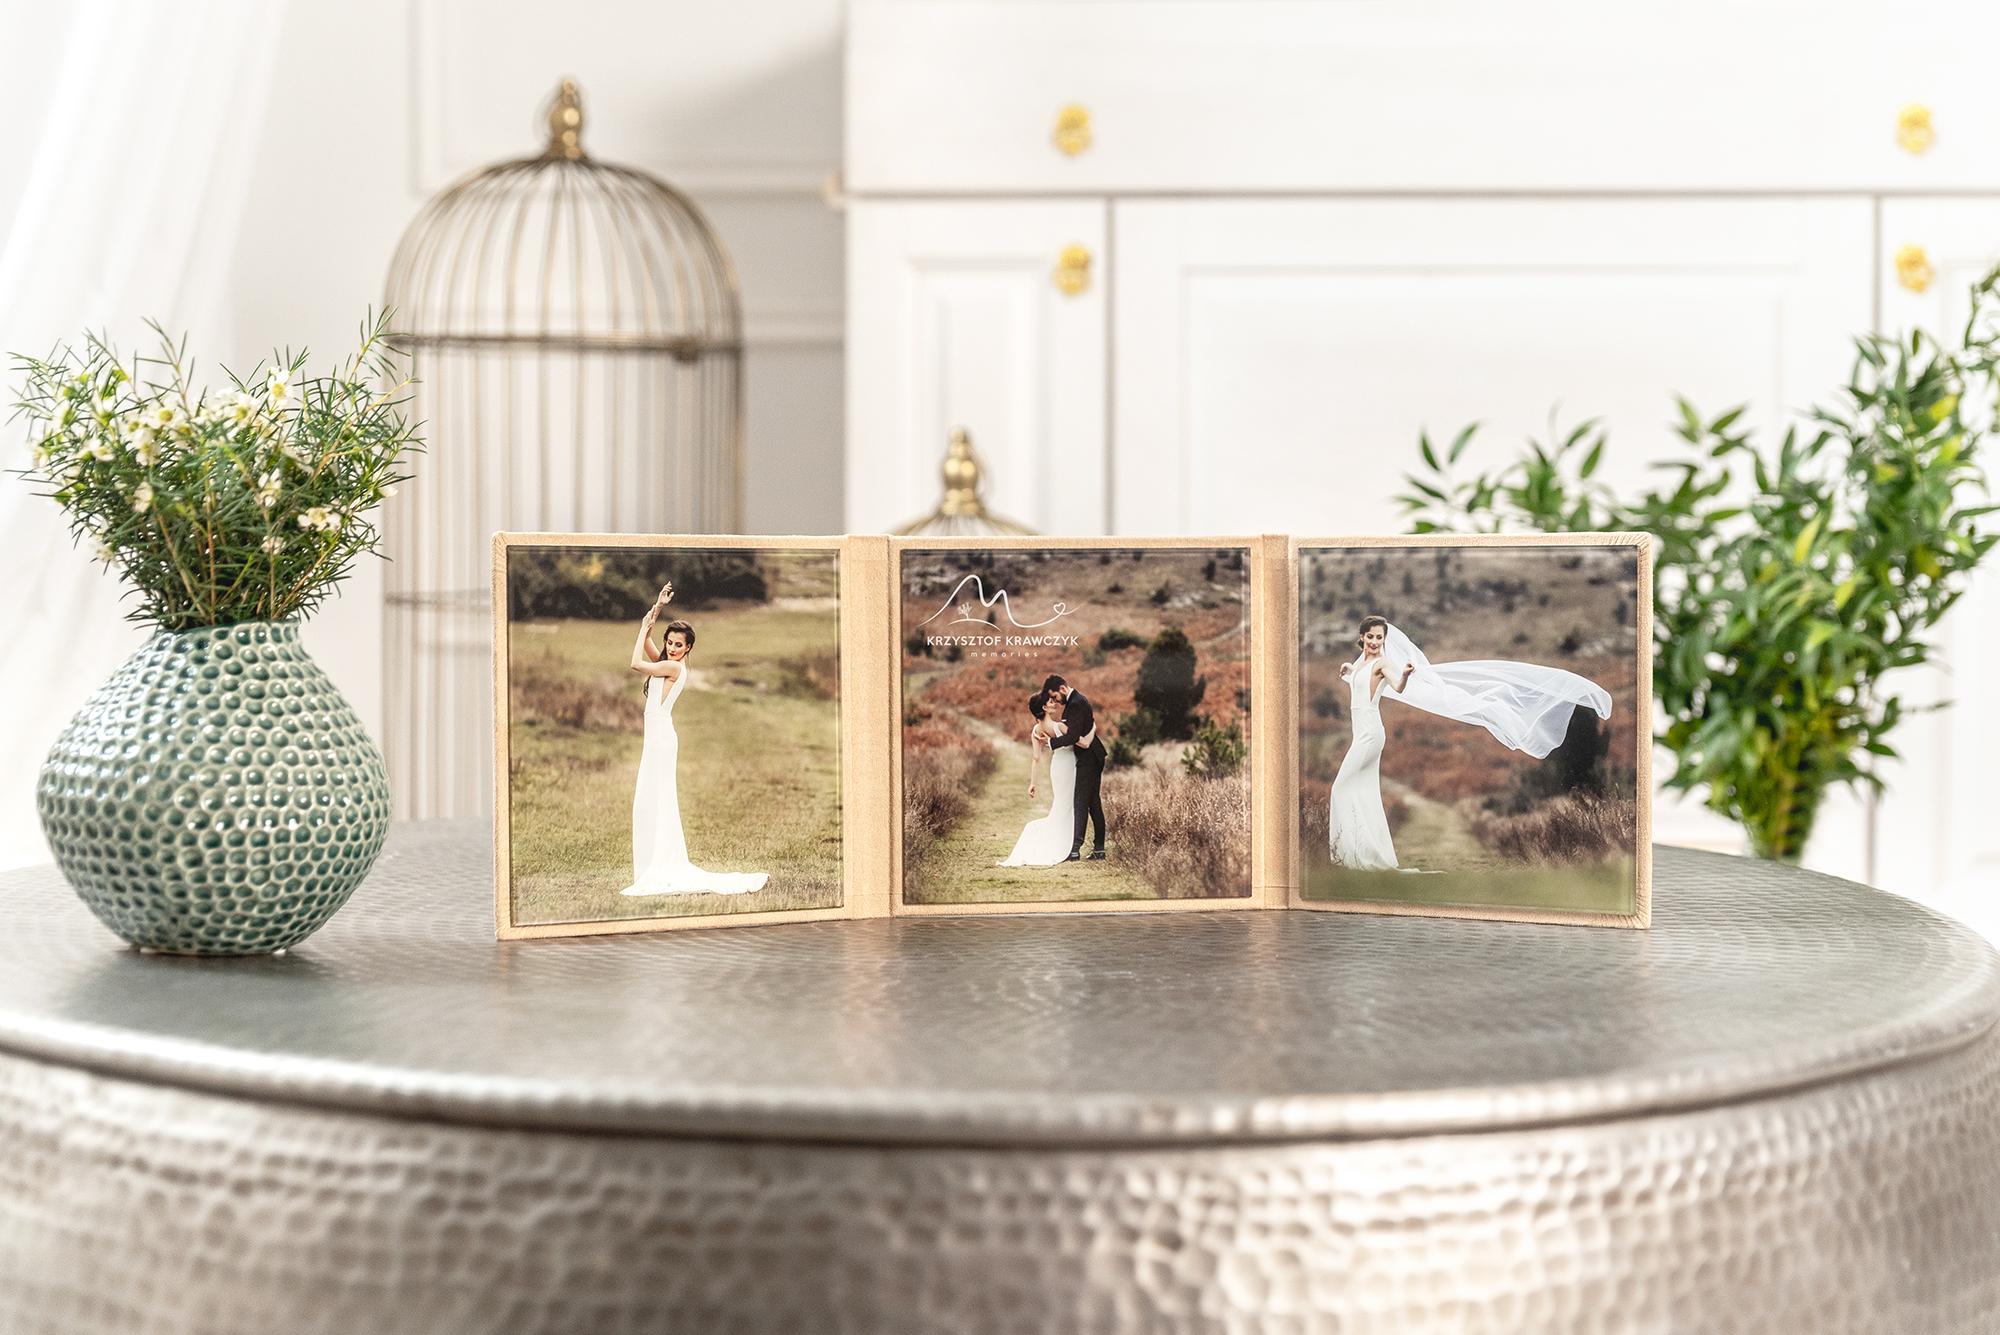 wedding photo book in acrylic